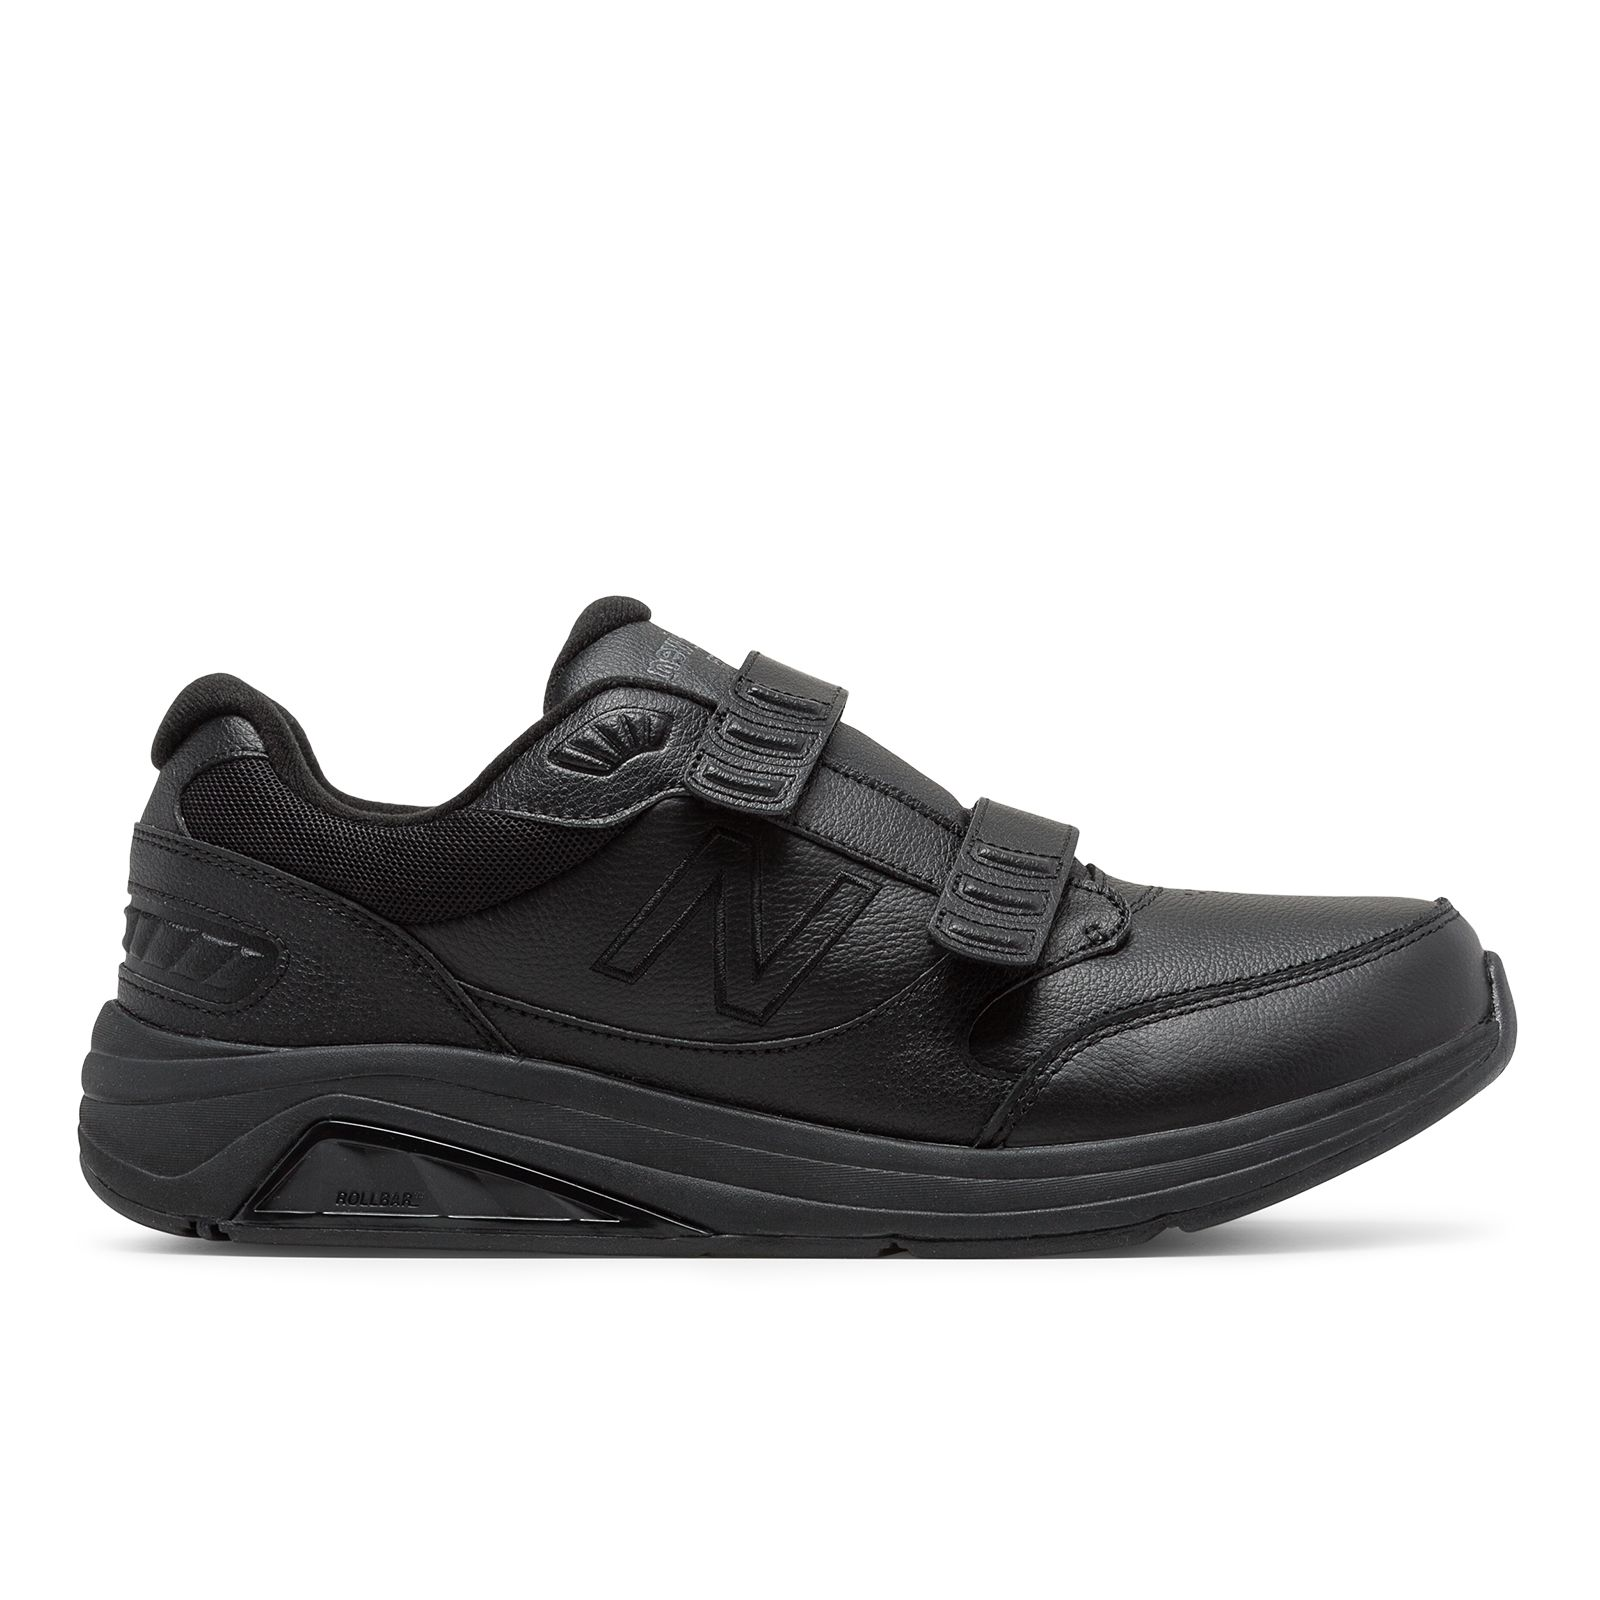 men's new balance velcro shoes